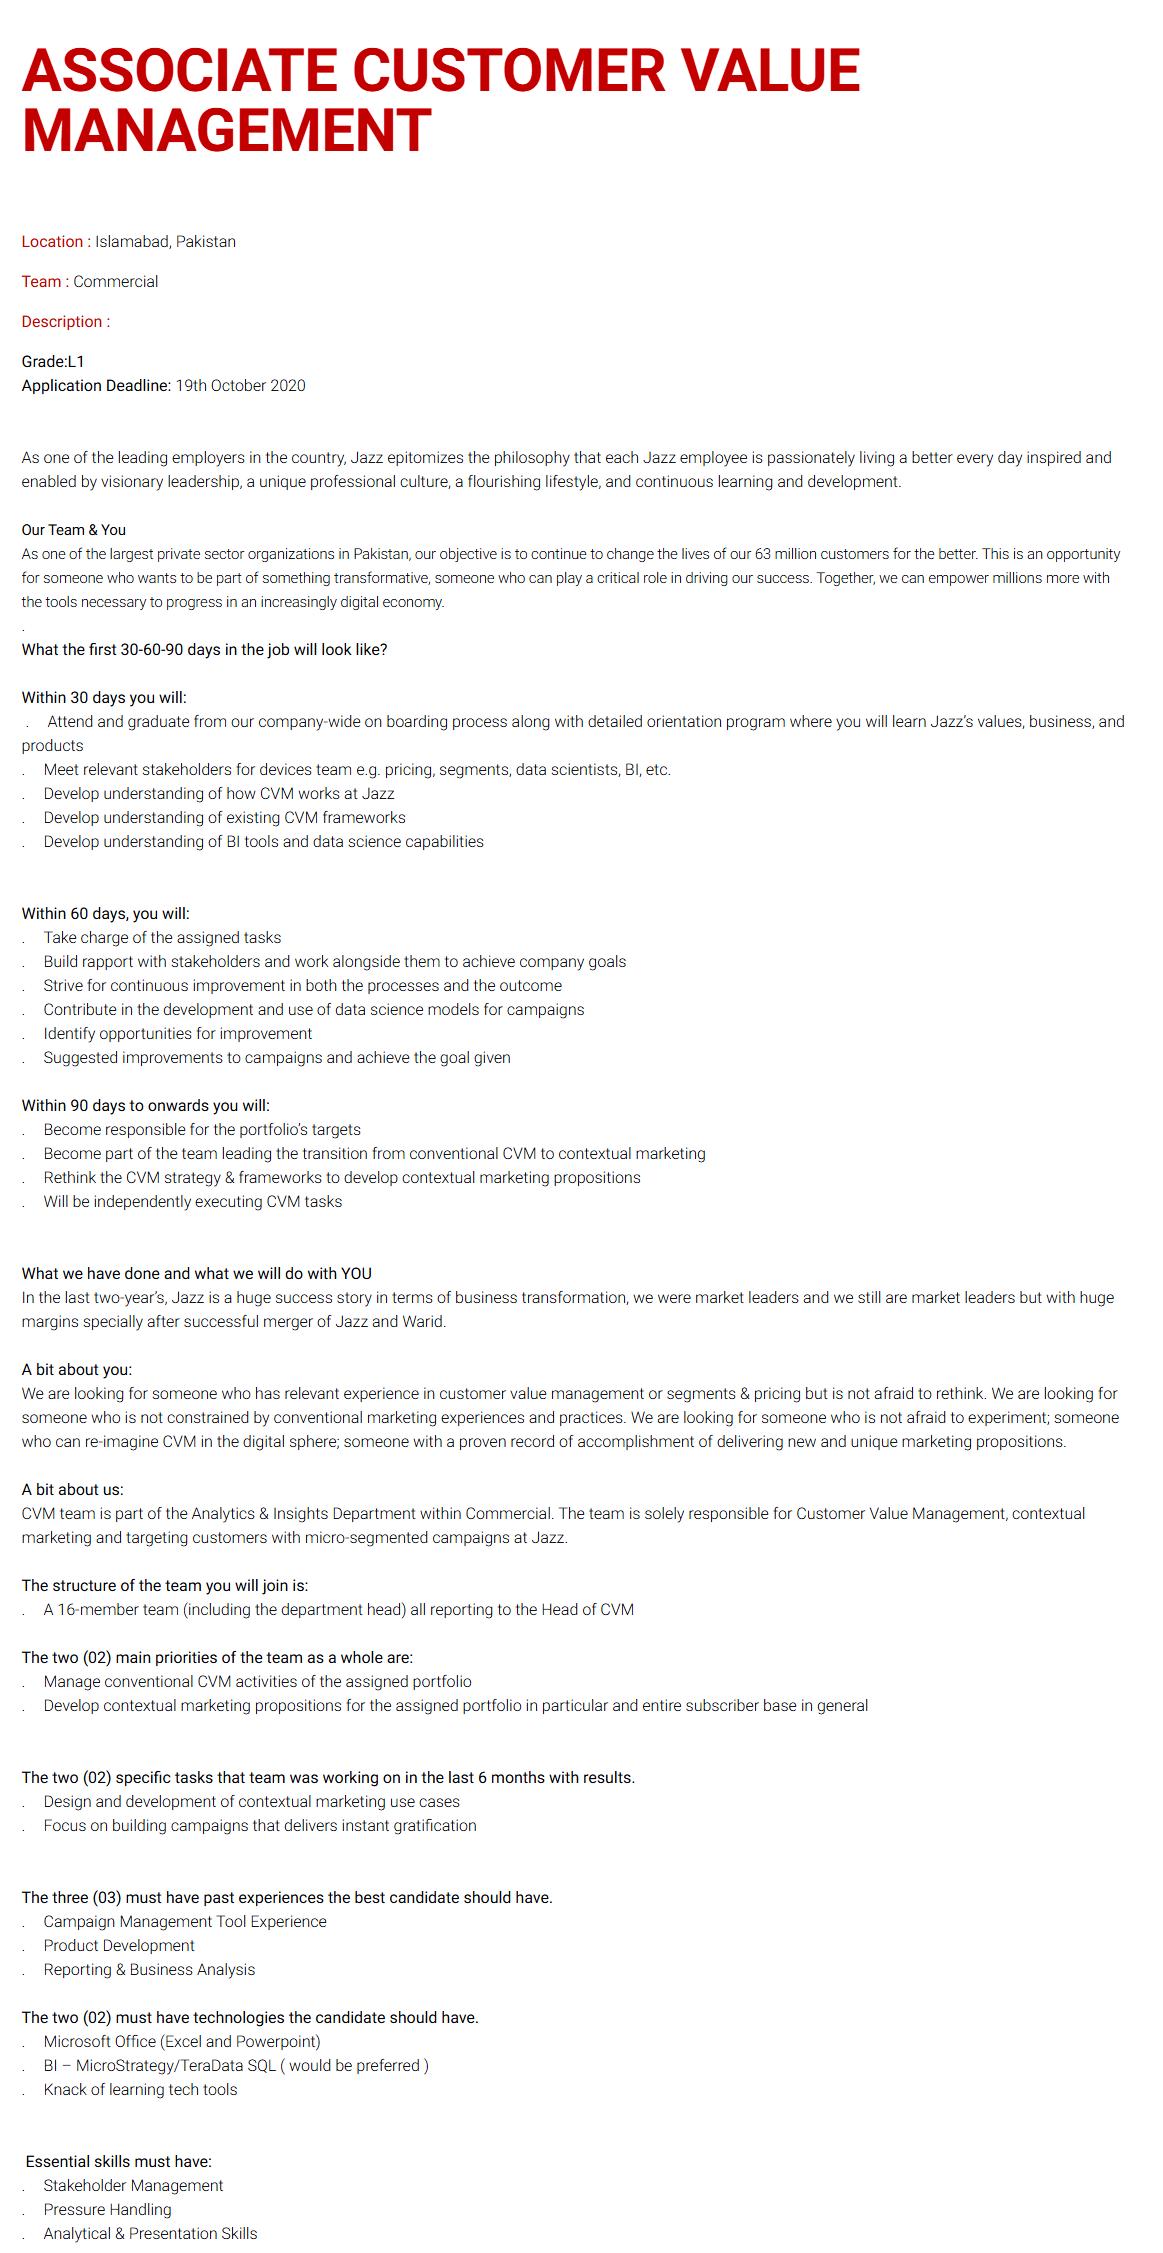 Associate Customer Value Management Jobs 2020 in Islamabad